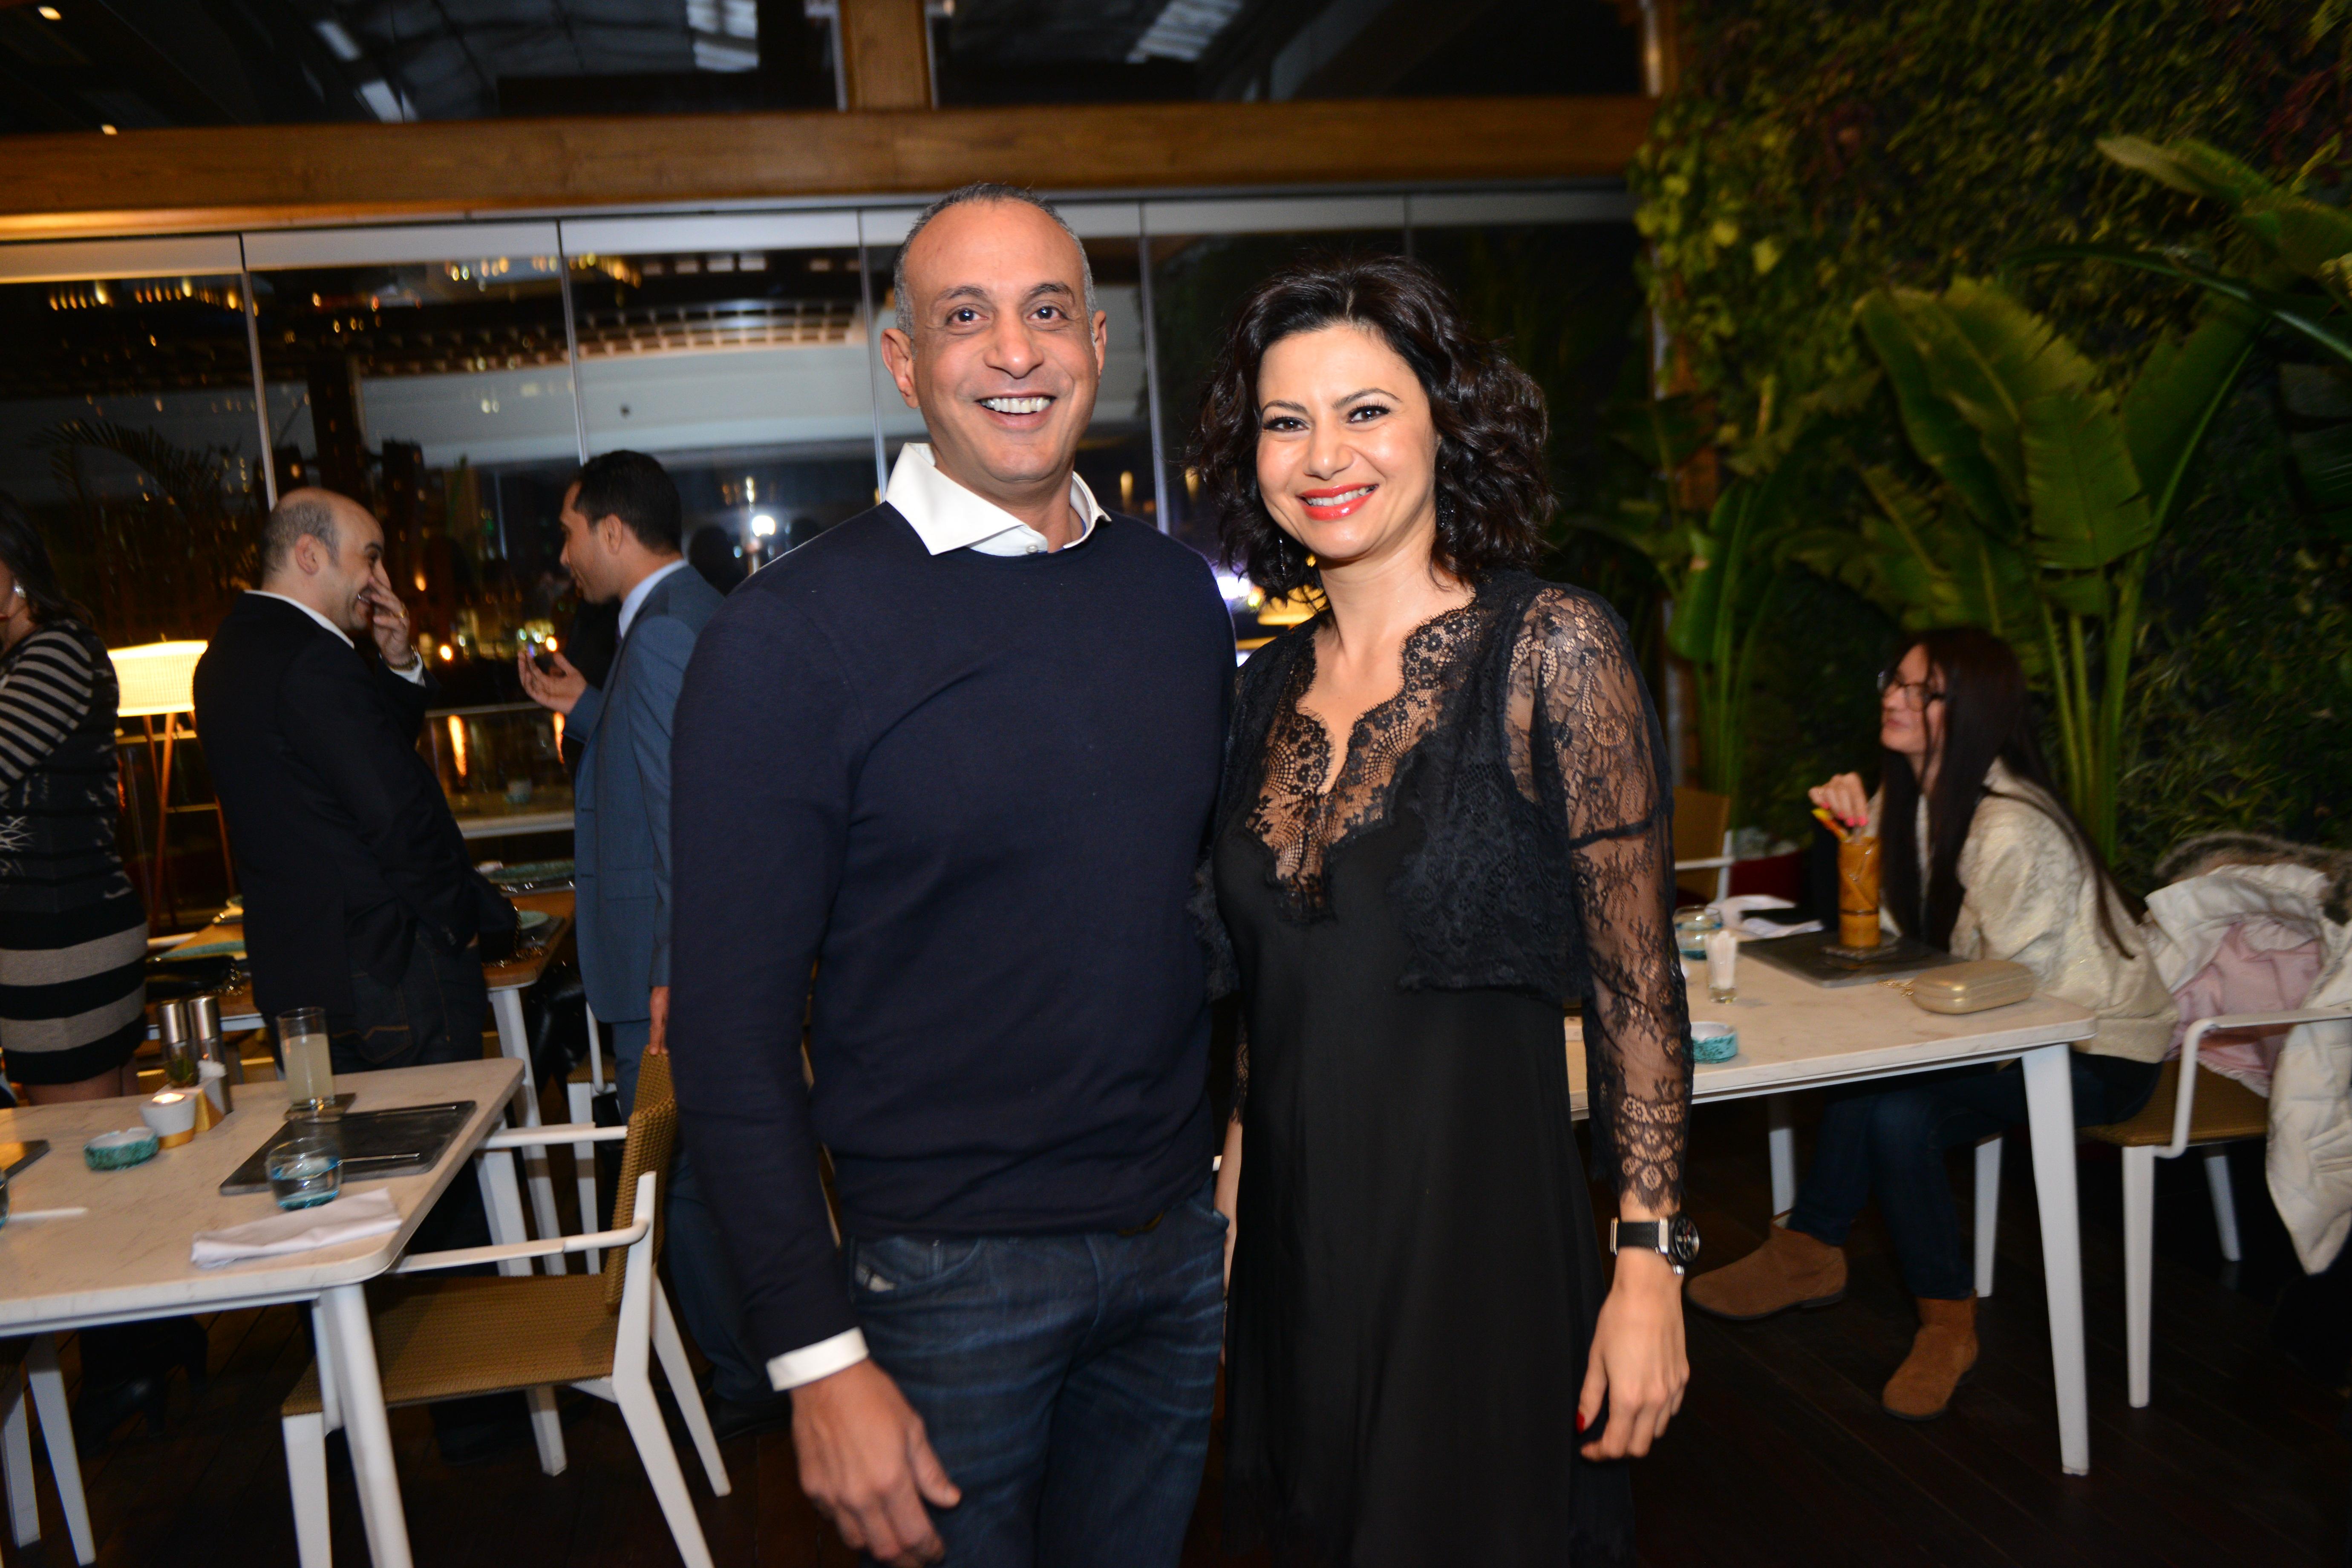 Mr. Sherif Elshafei & Ms. Nadia Saady